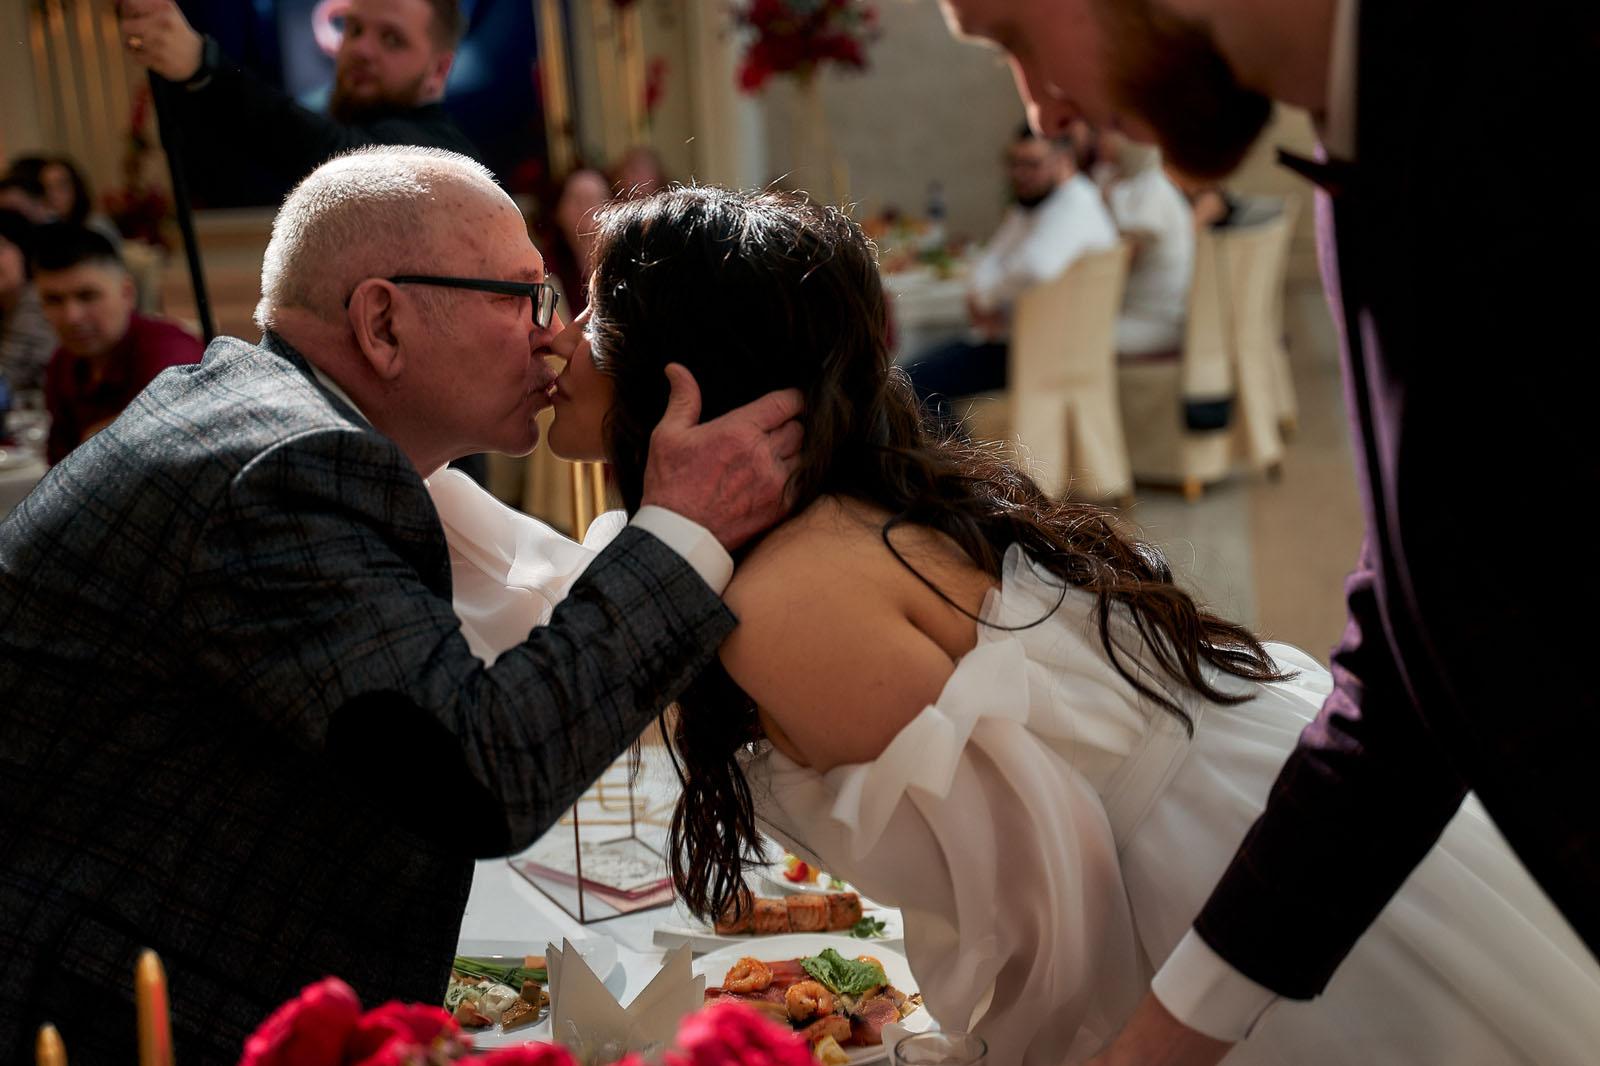 wedding@bekarev2021-04-10-18-44-14.jpg